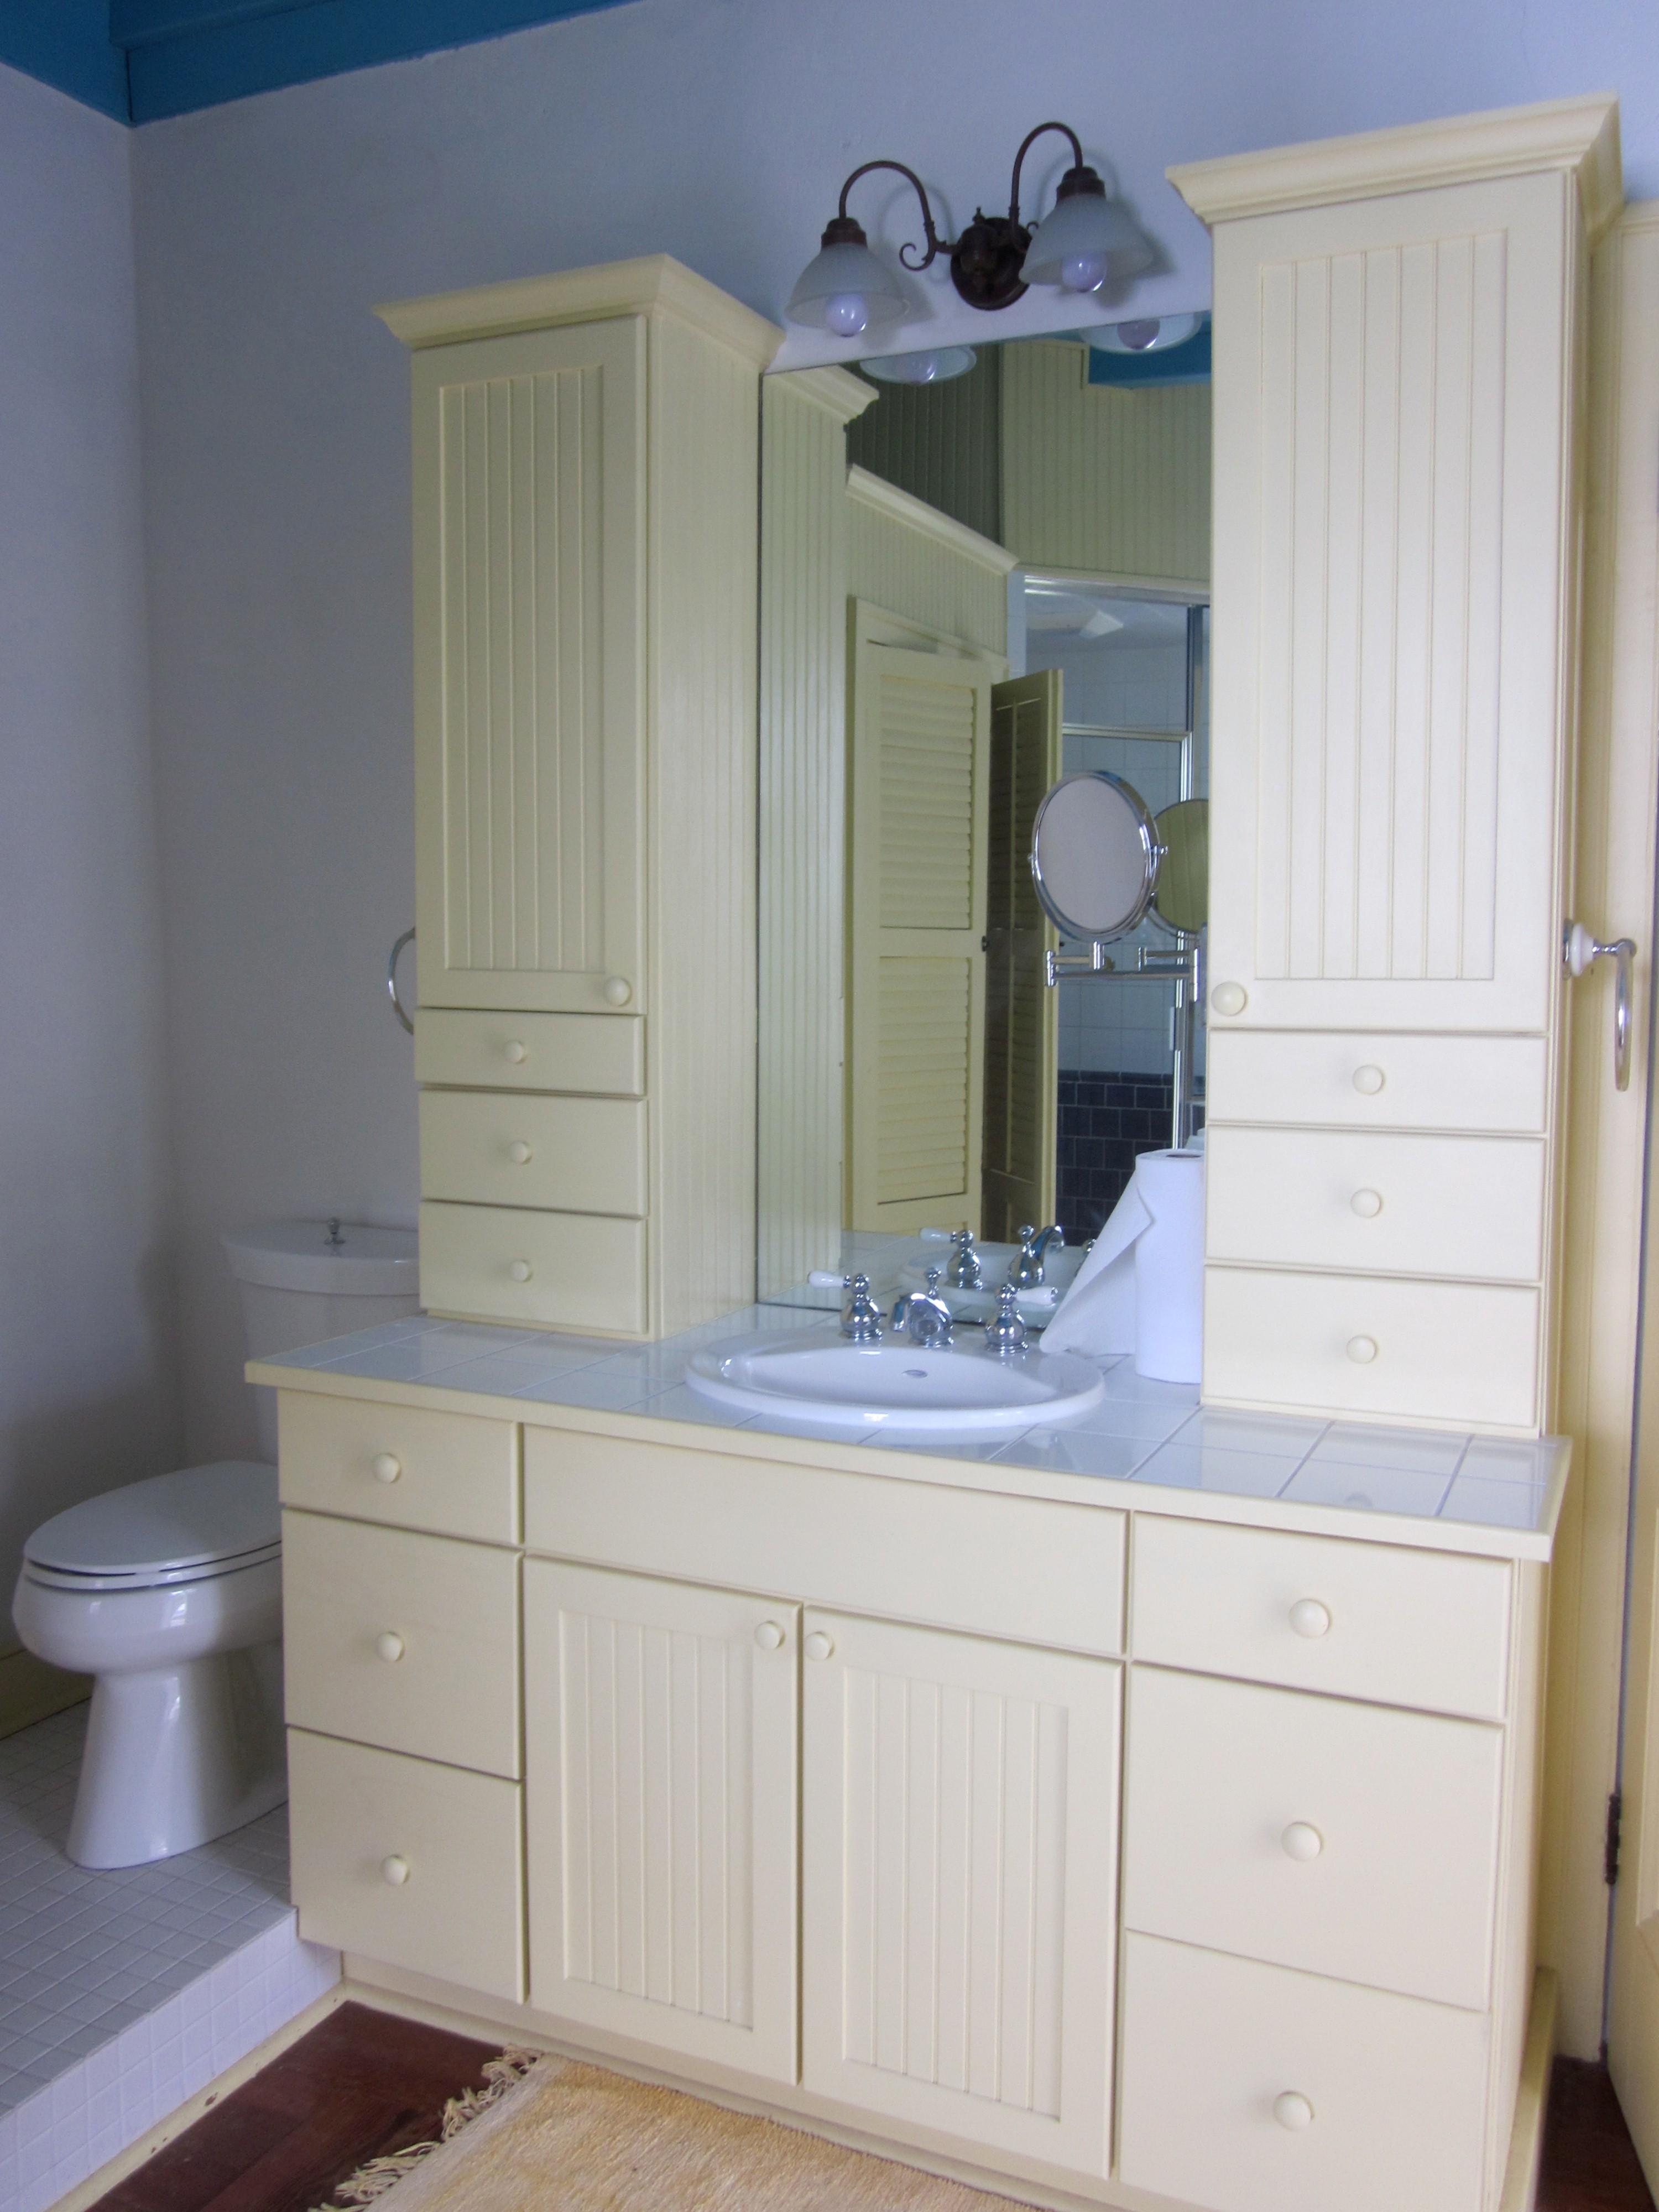 fantastic home depot bathroom light fixtures inspiration-Contemporary Home Depot Bathroom Light Fixtures Picture